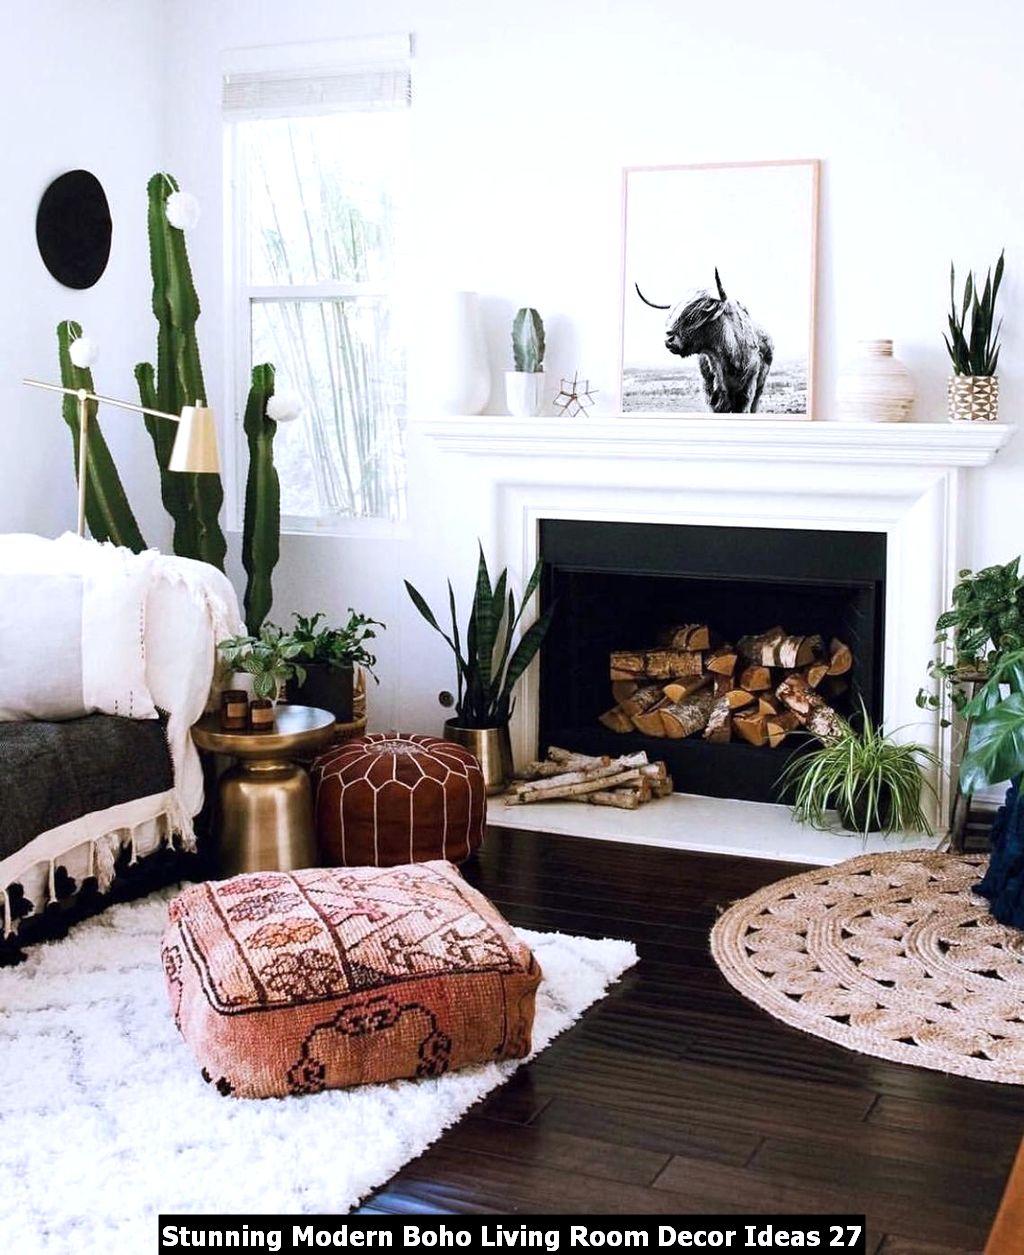 Stunning Modern Boho Living Room Decor Ideas 27